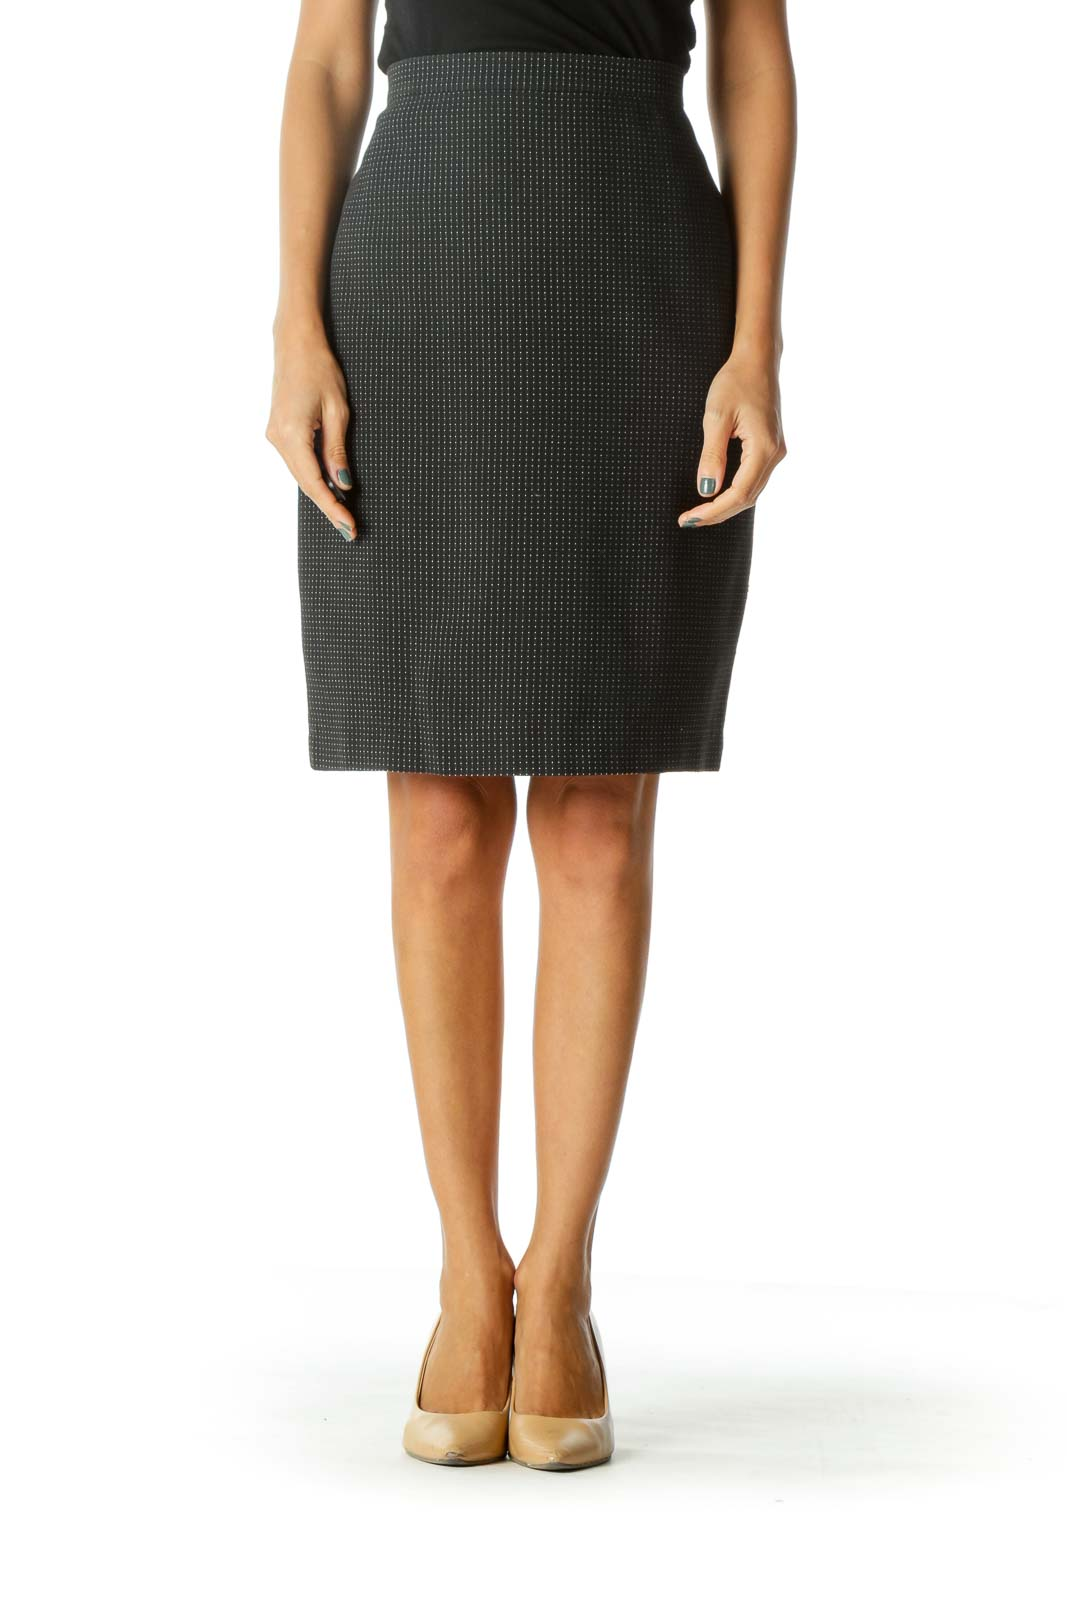 Black White Textured Pattern 100% Cotton Skirt Front